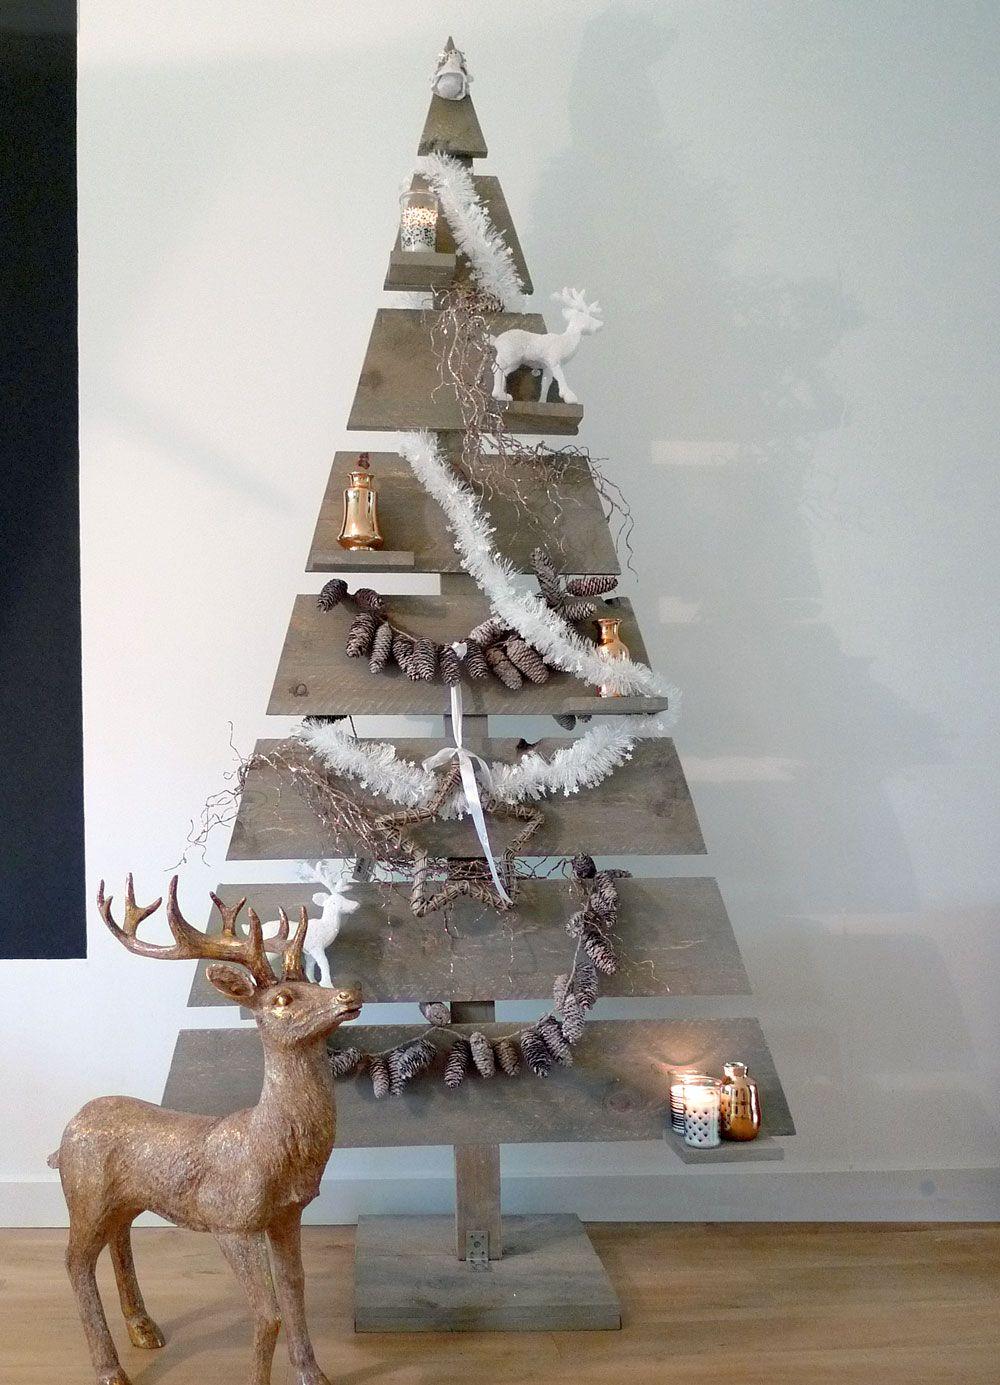 Houten Kerstboom hoogte 175 cm Kerstboom hout strak model